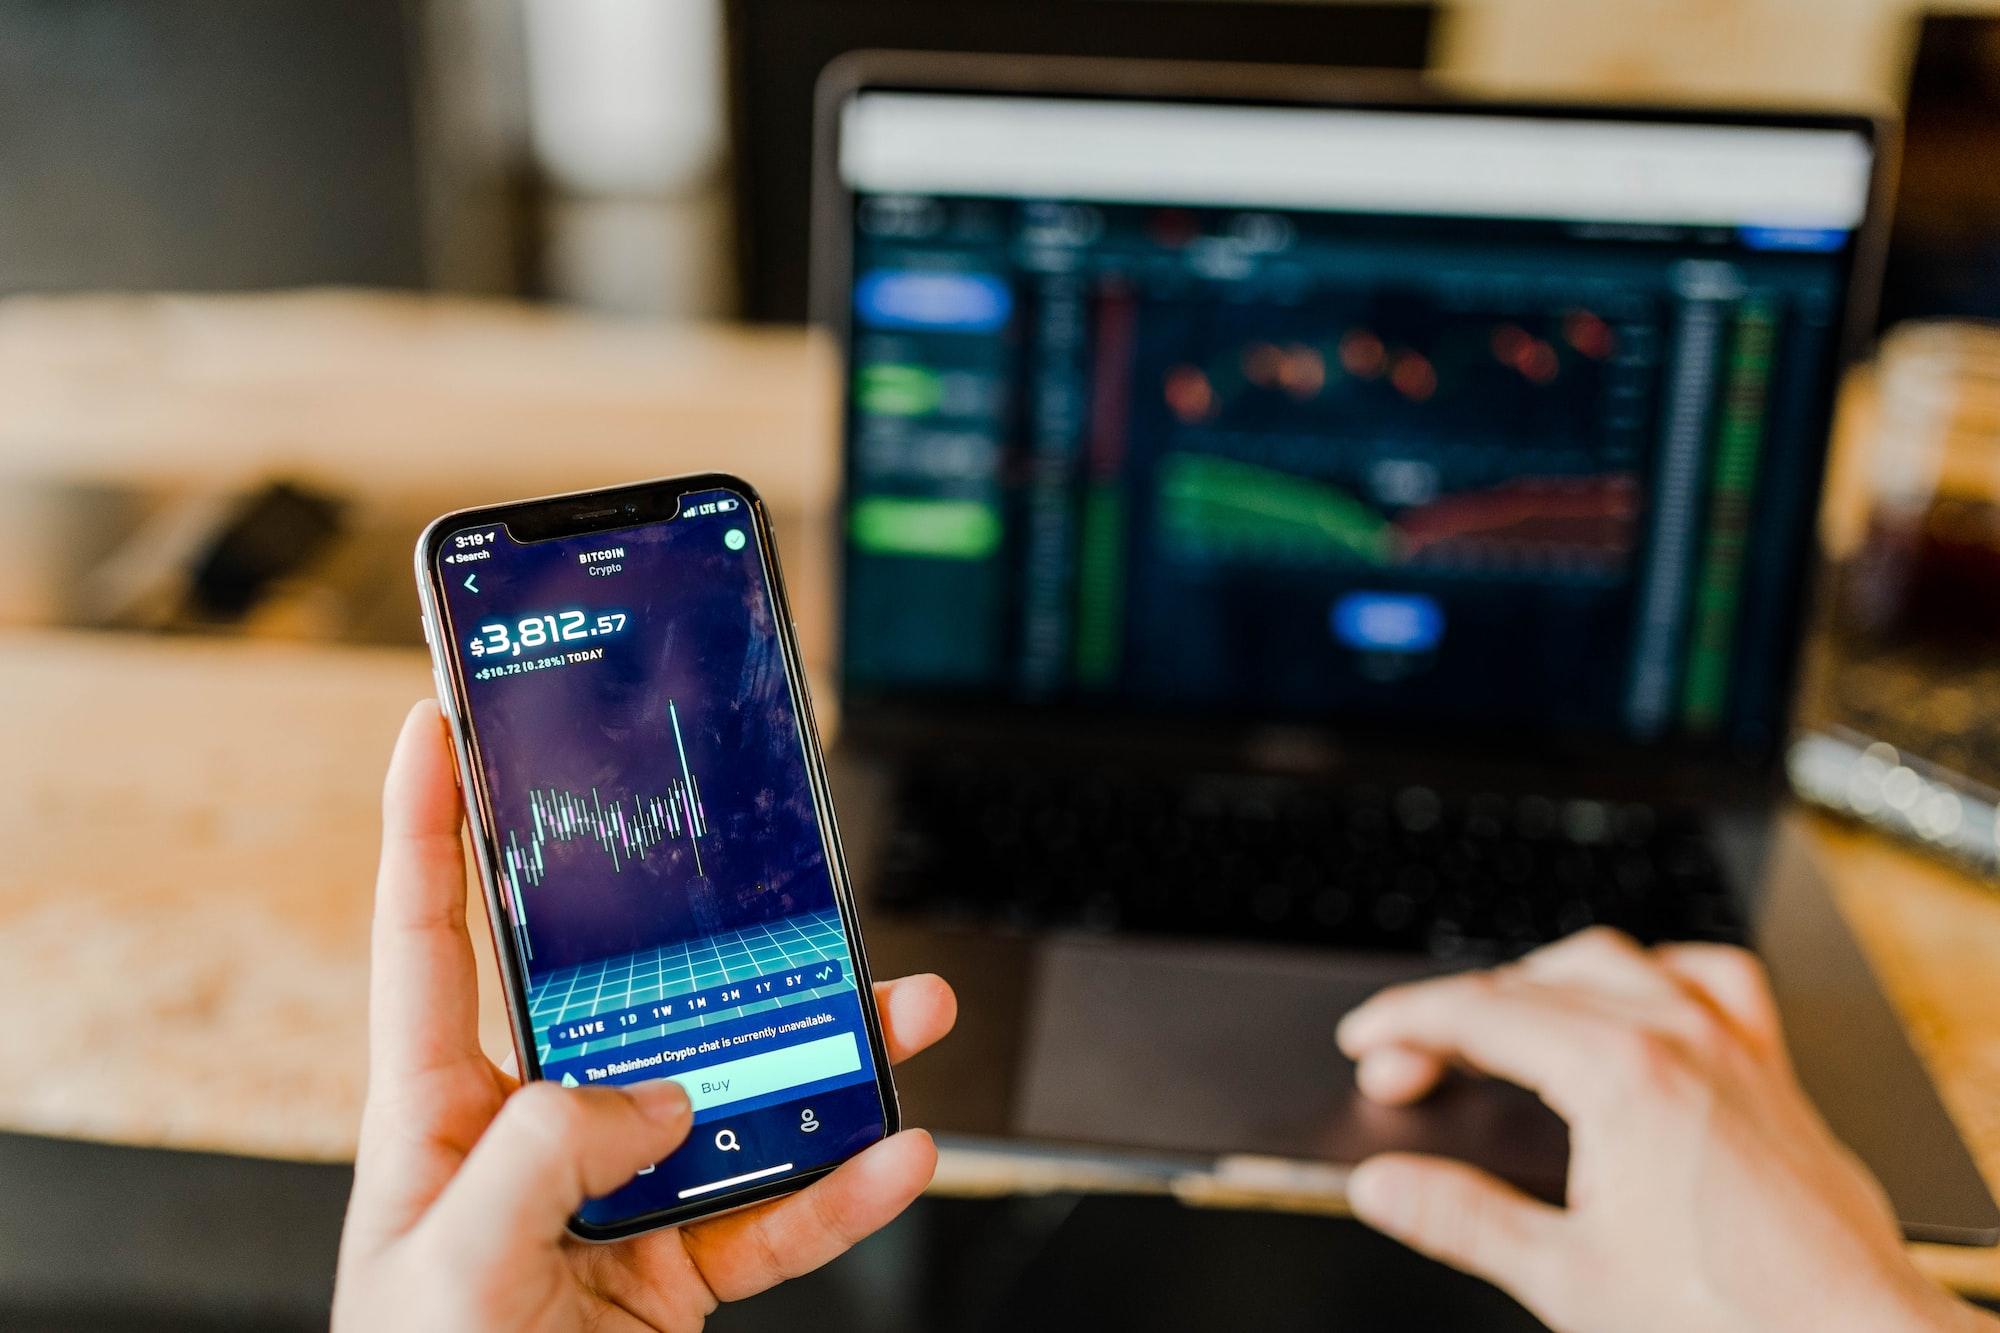 GameStop暴漲1700%的股市神話-散戶與大戶的股票大戰(上)